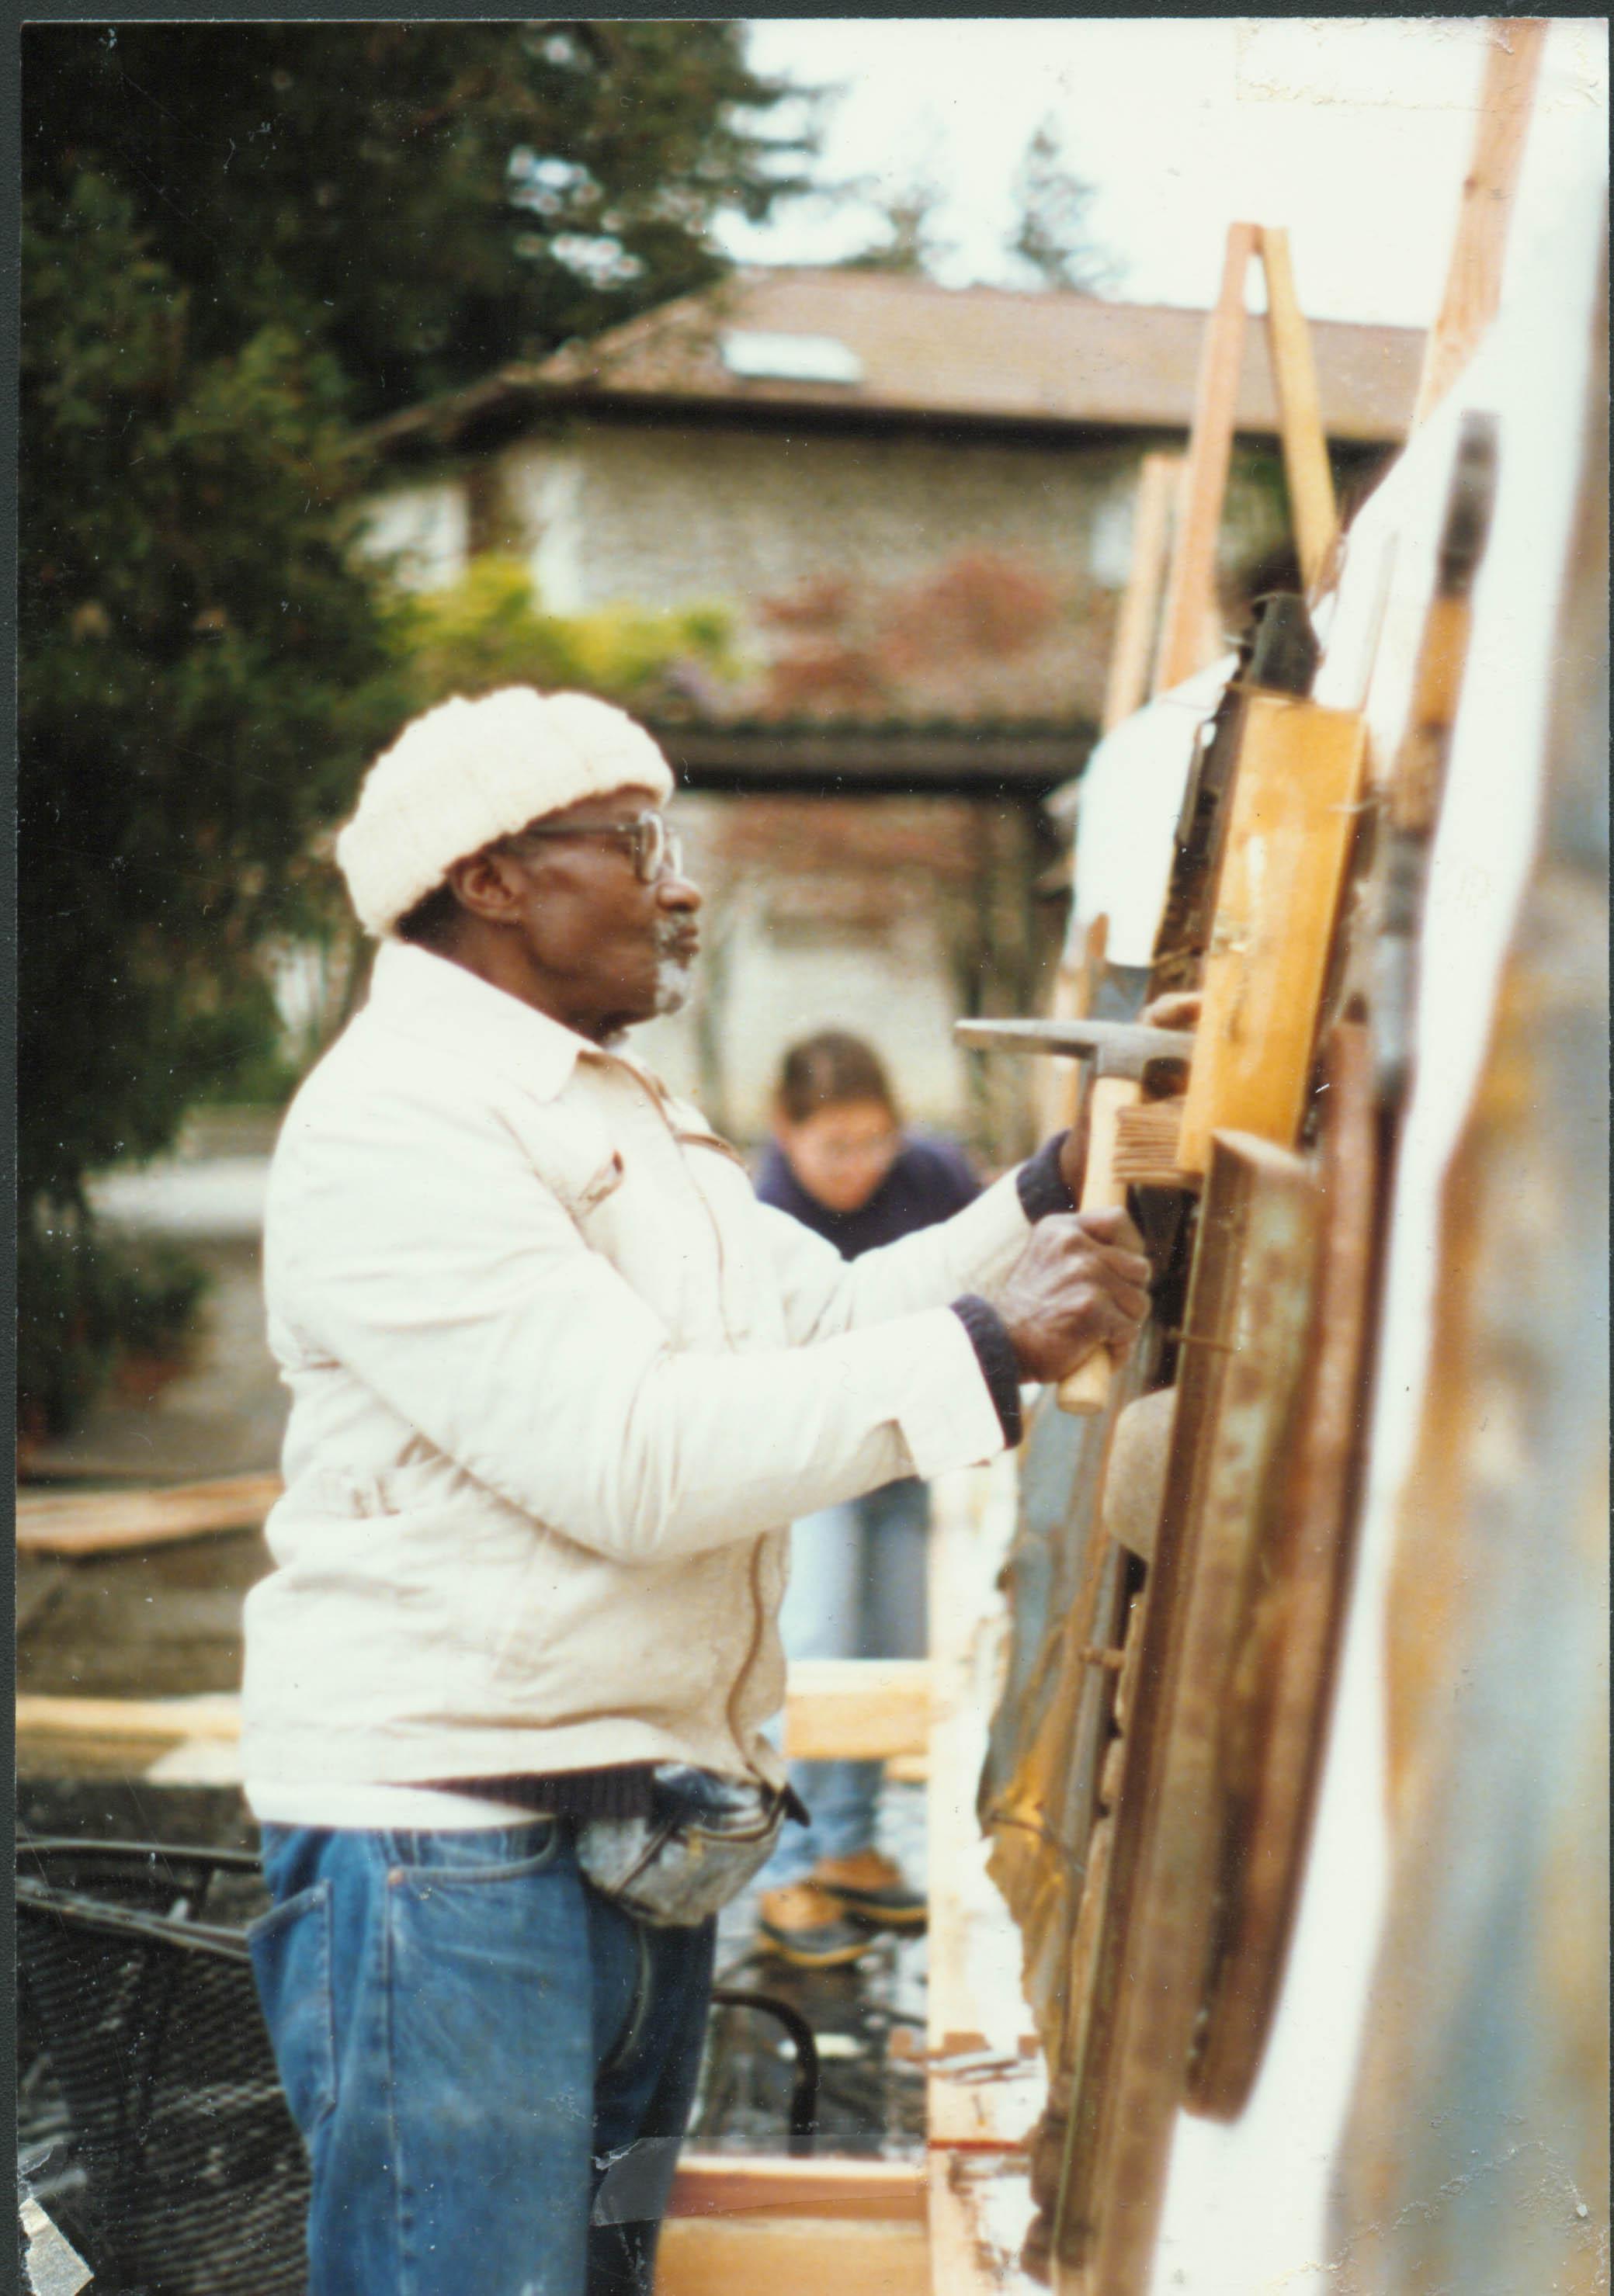 Noah at Cowell College, UC,Santa Cruz, 1990